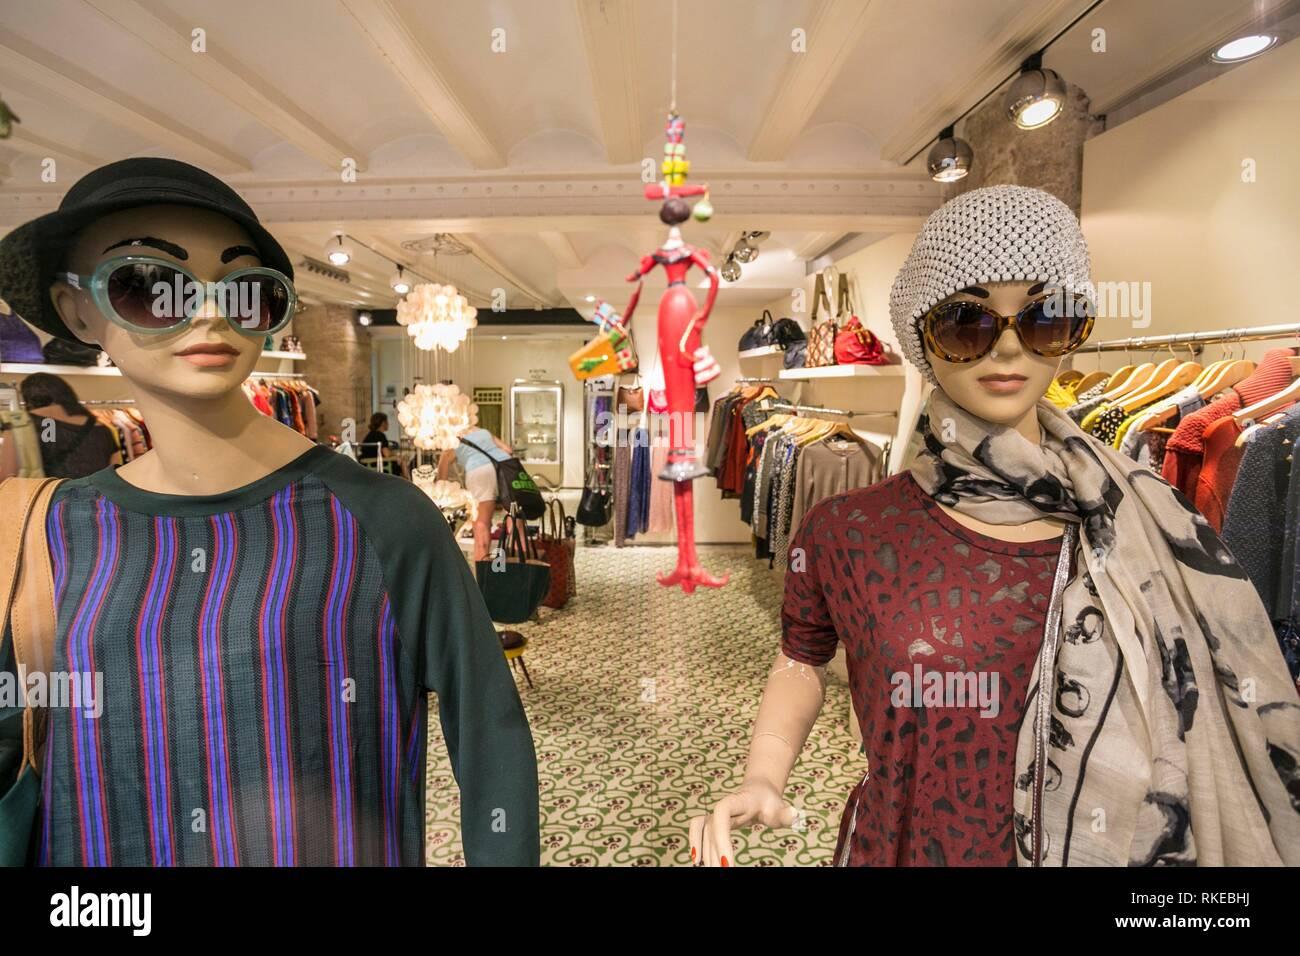 ea16c36189ab45 Fashion Spanish Shop Stockfotos   Fashion Spanish Shop Bilder - Alamy